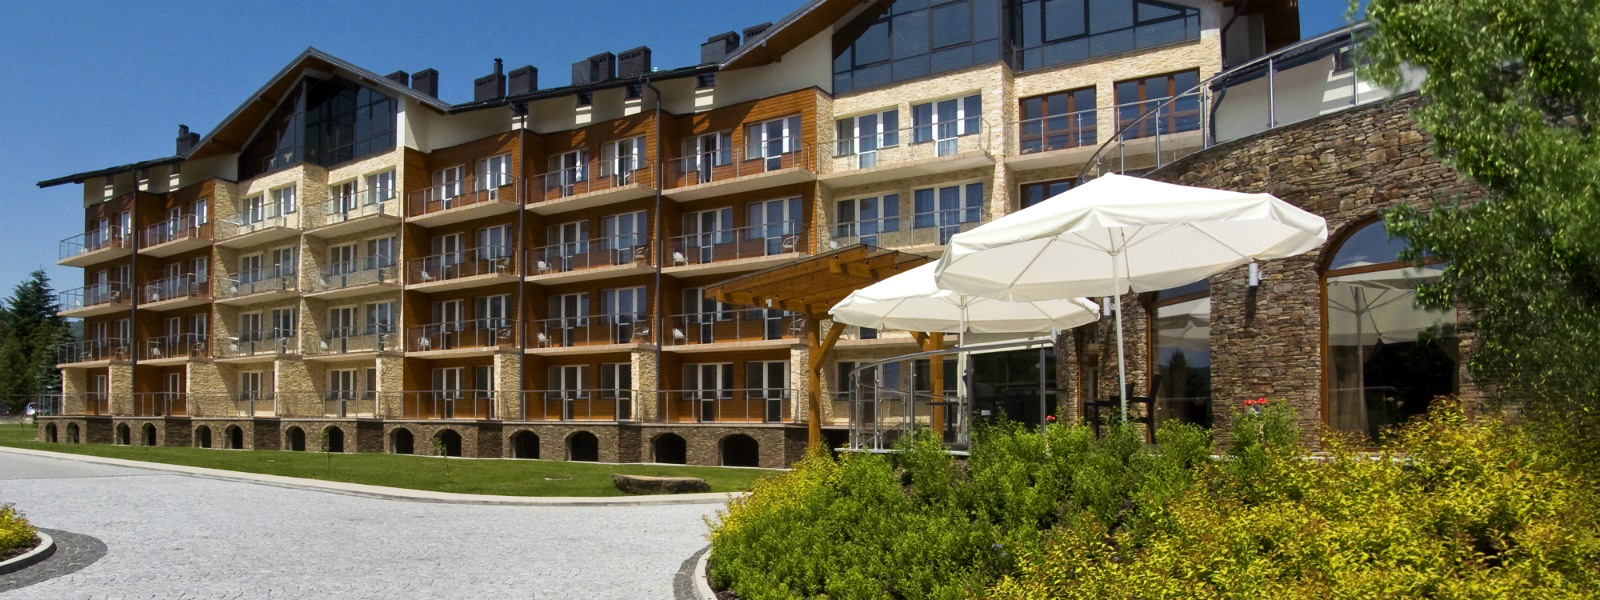 Hotel Activa - zdjęcie 01